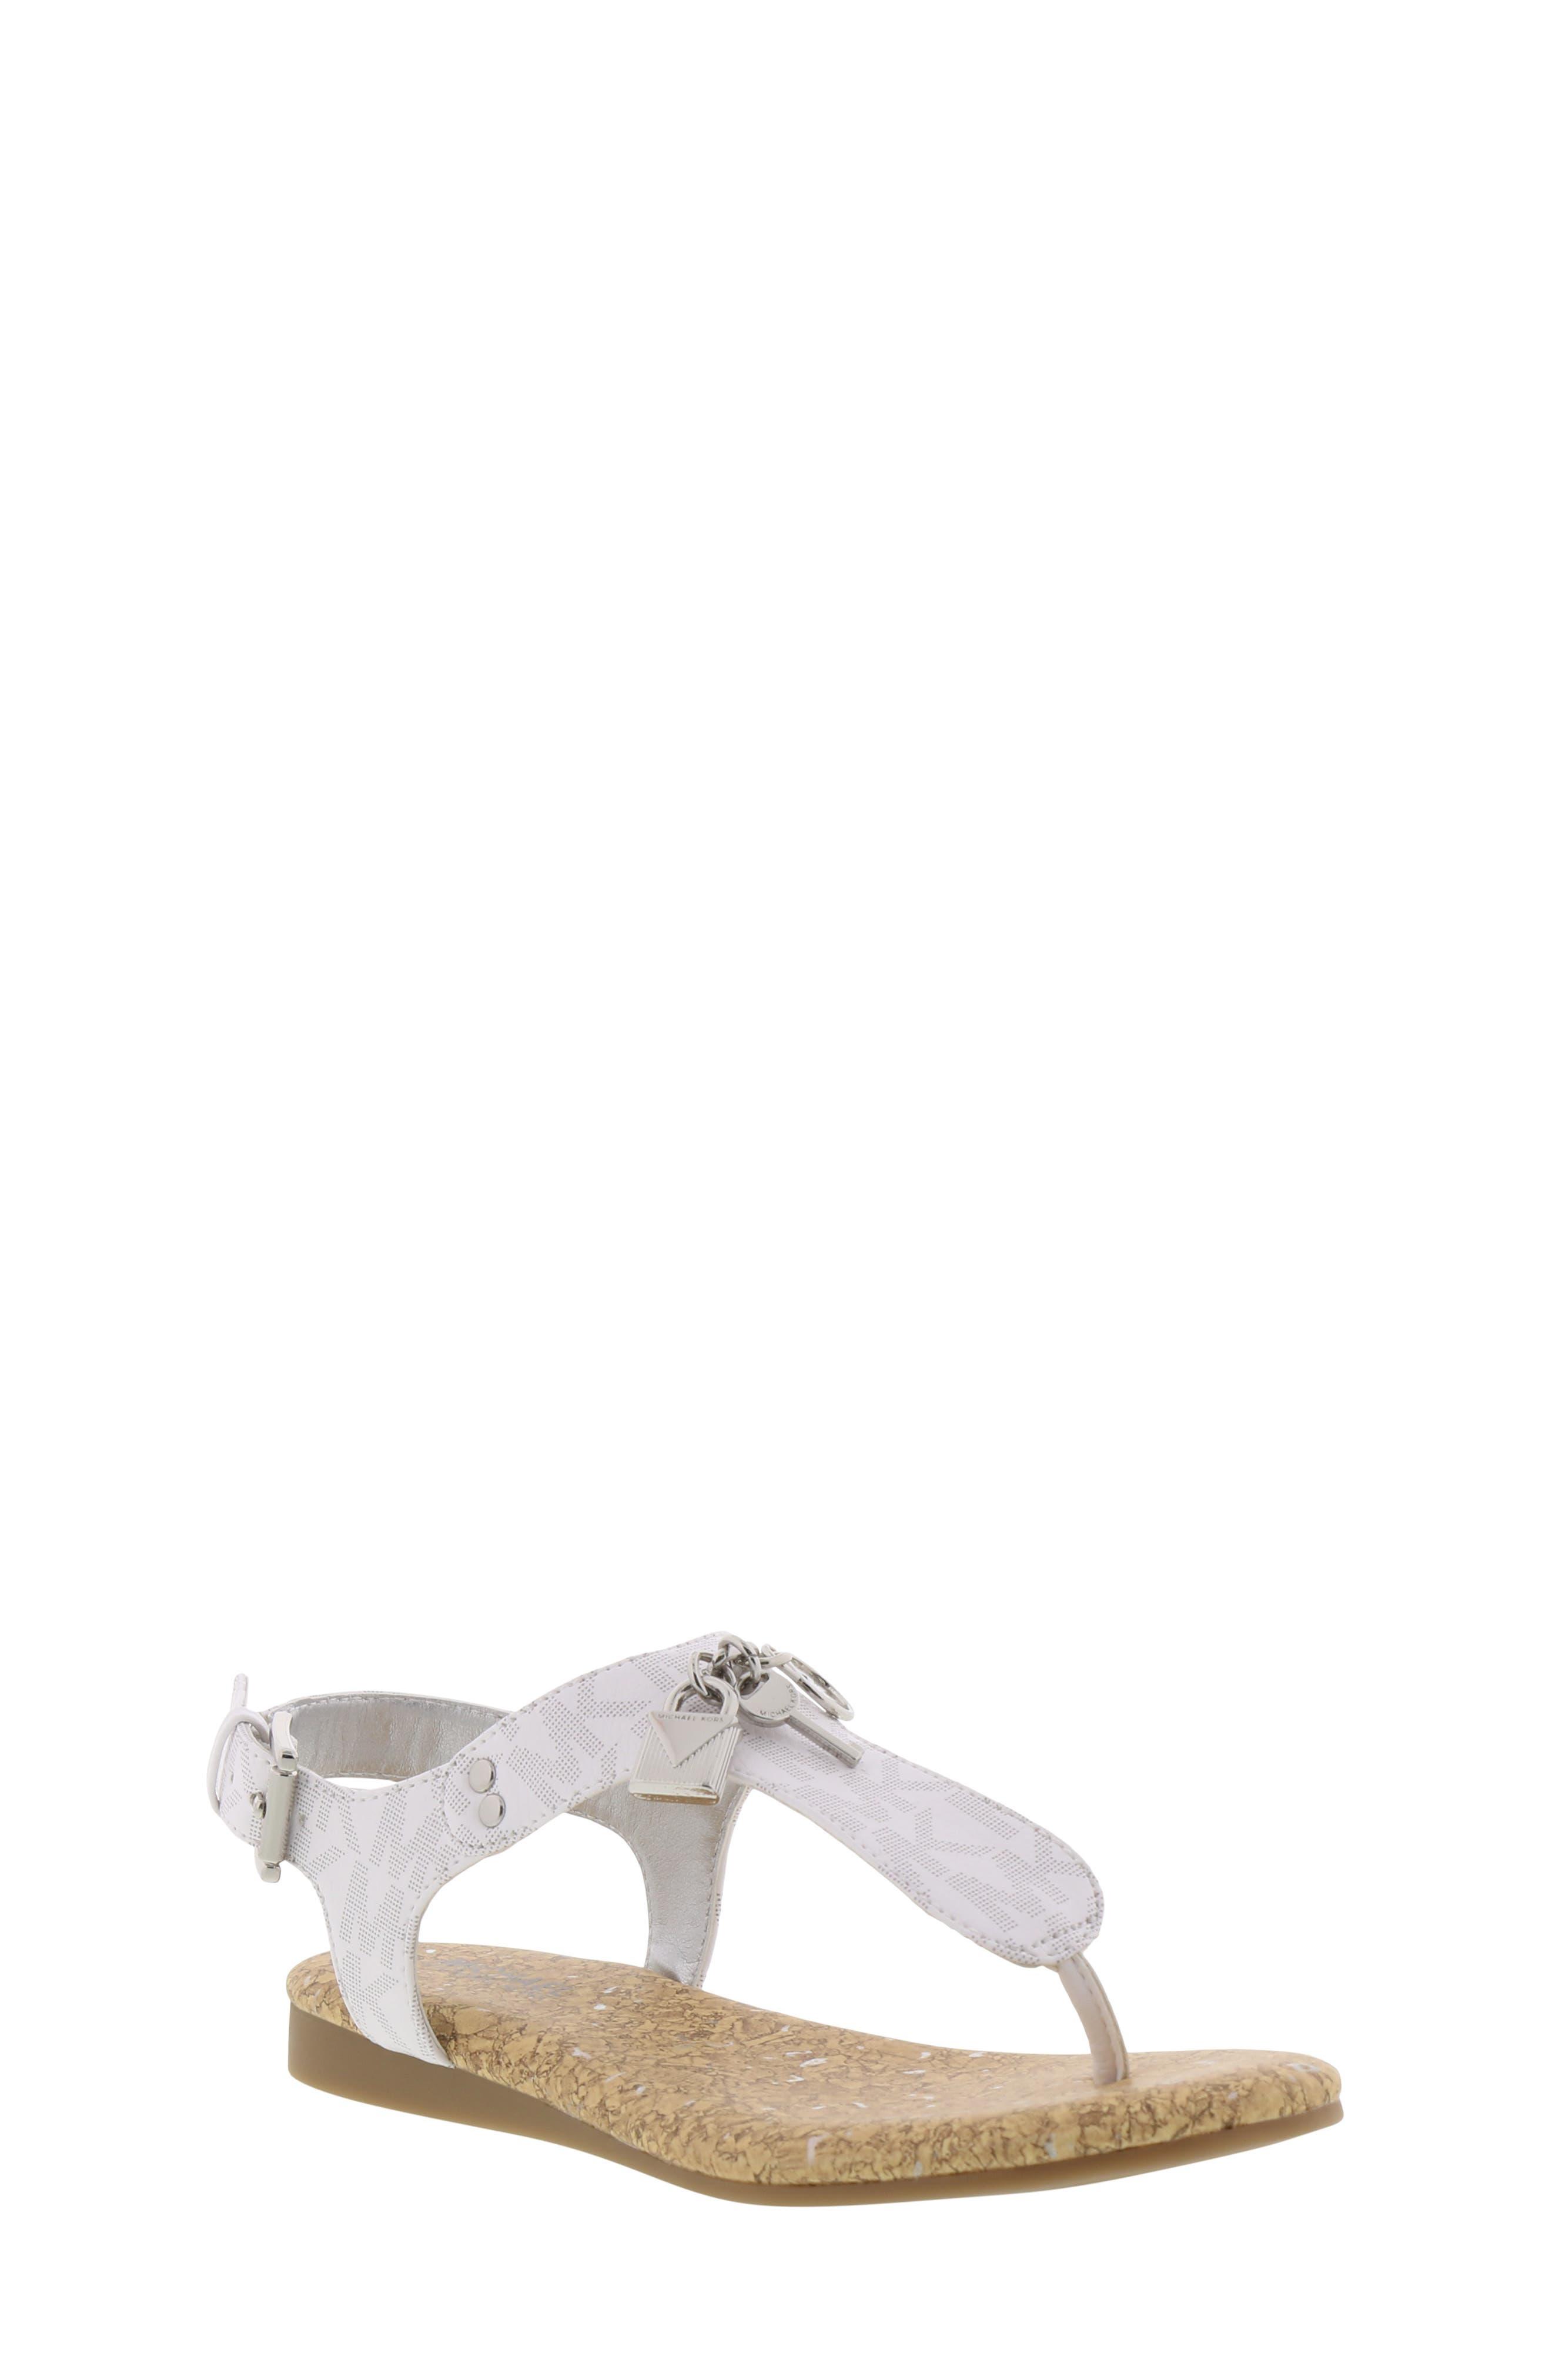 MICHAEL MICHAEL KORS, Tilly Cora Charm T-Strap Sandal, Main thumbnail 1, color, WHITE LOGO